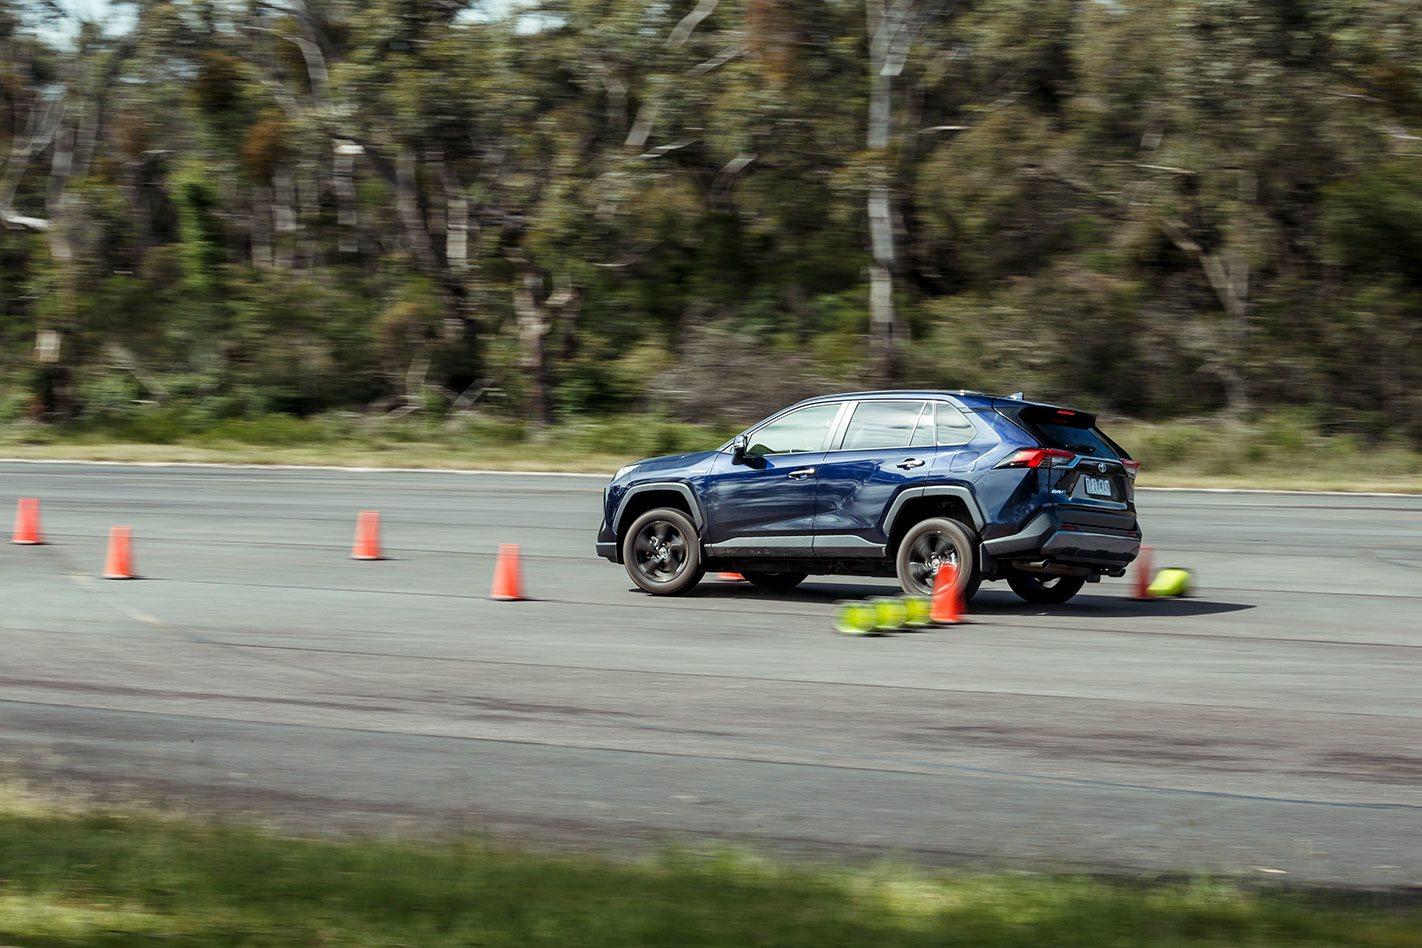 Wheels Car of the Year 2020 finalists: Toyota RAV4